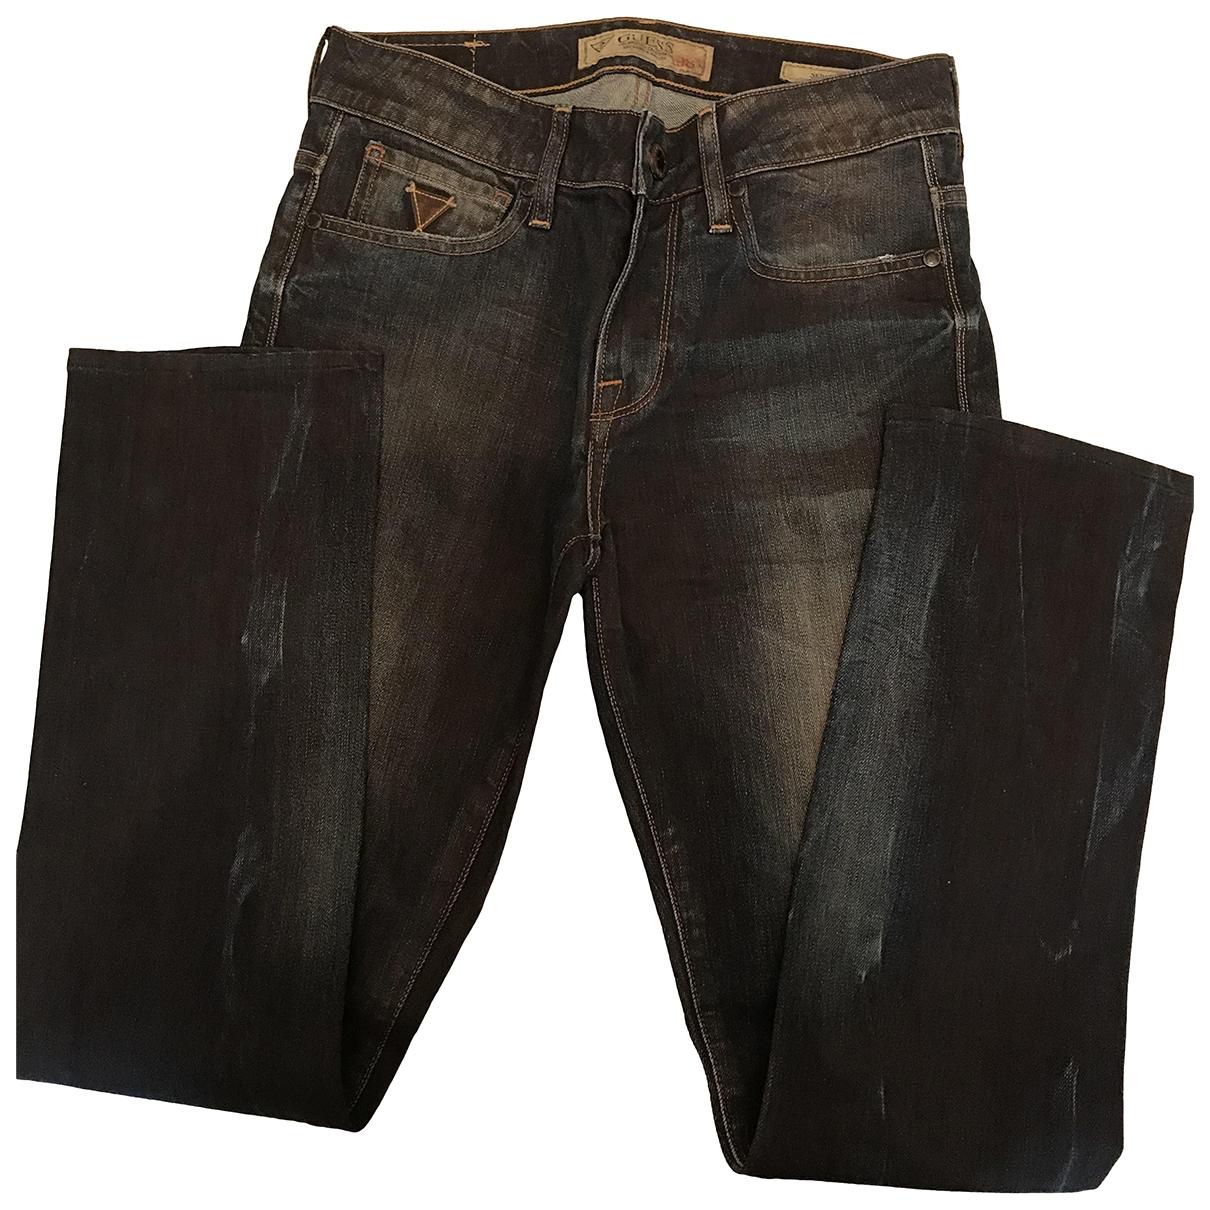 Guess \N Denim - Jeans Jeans for Women 40 FR